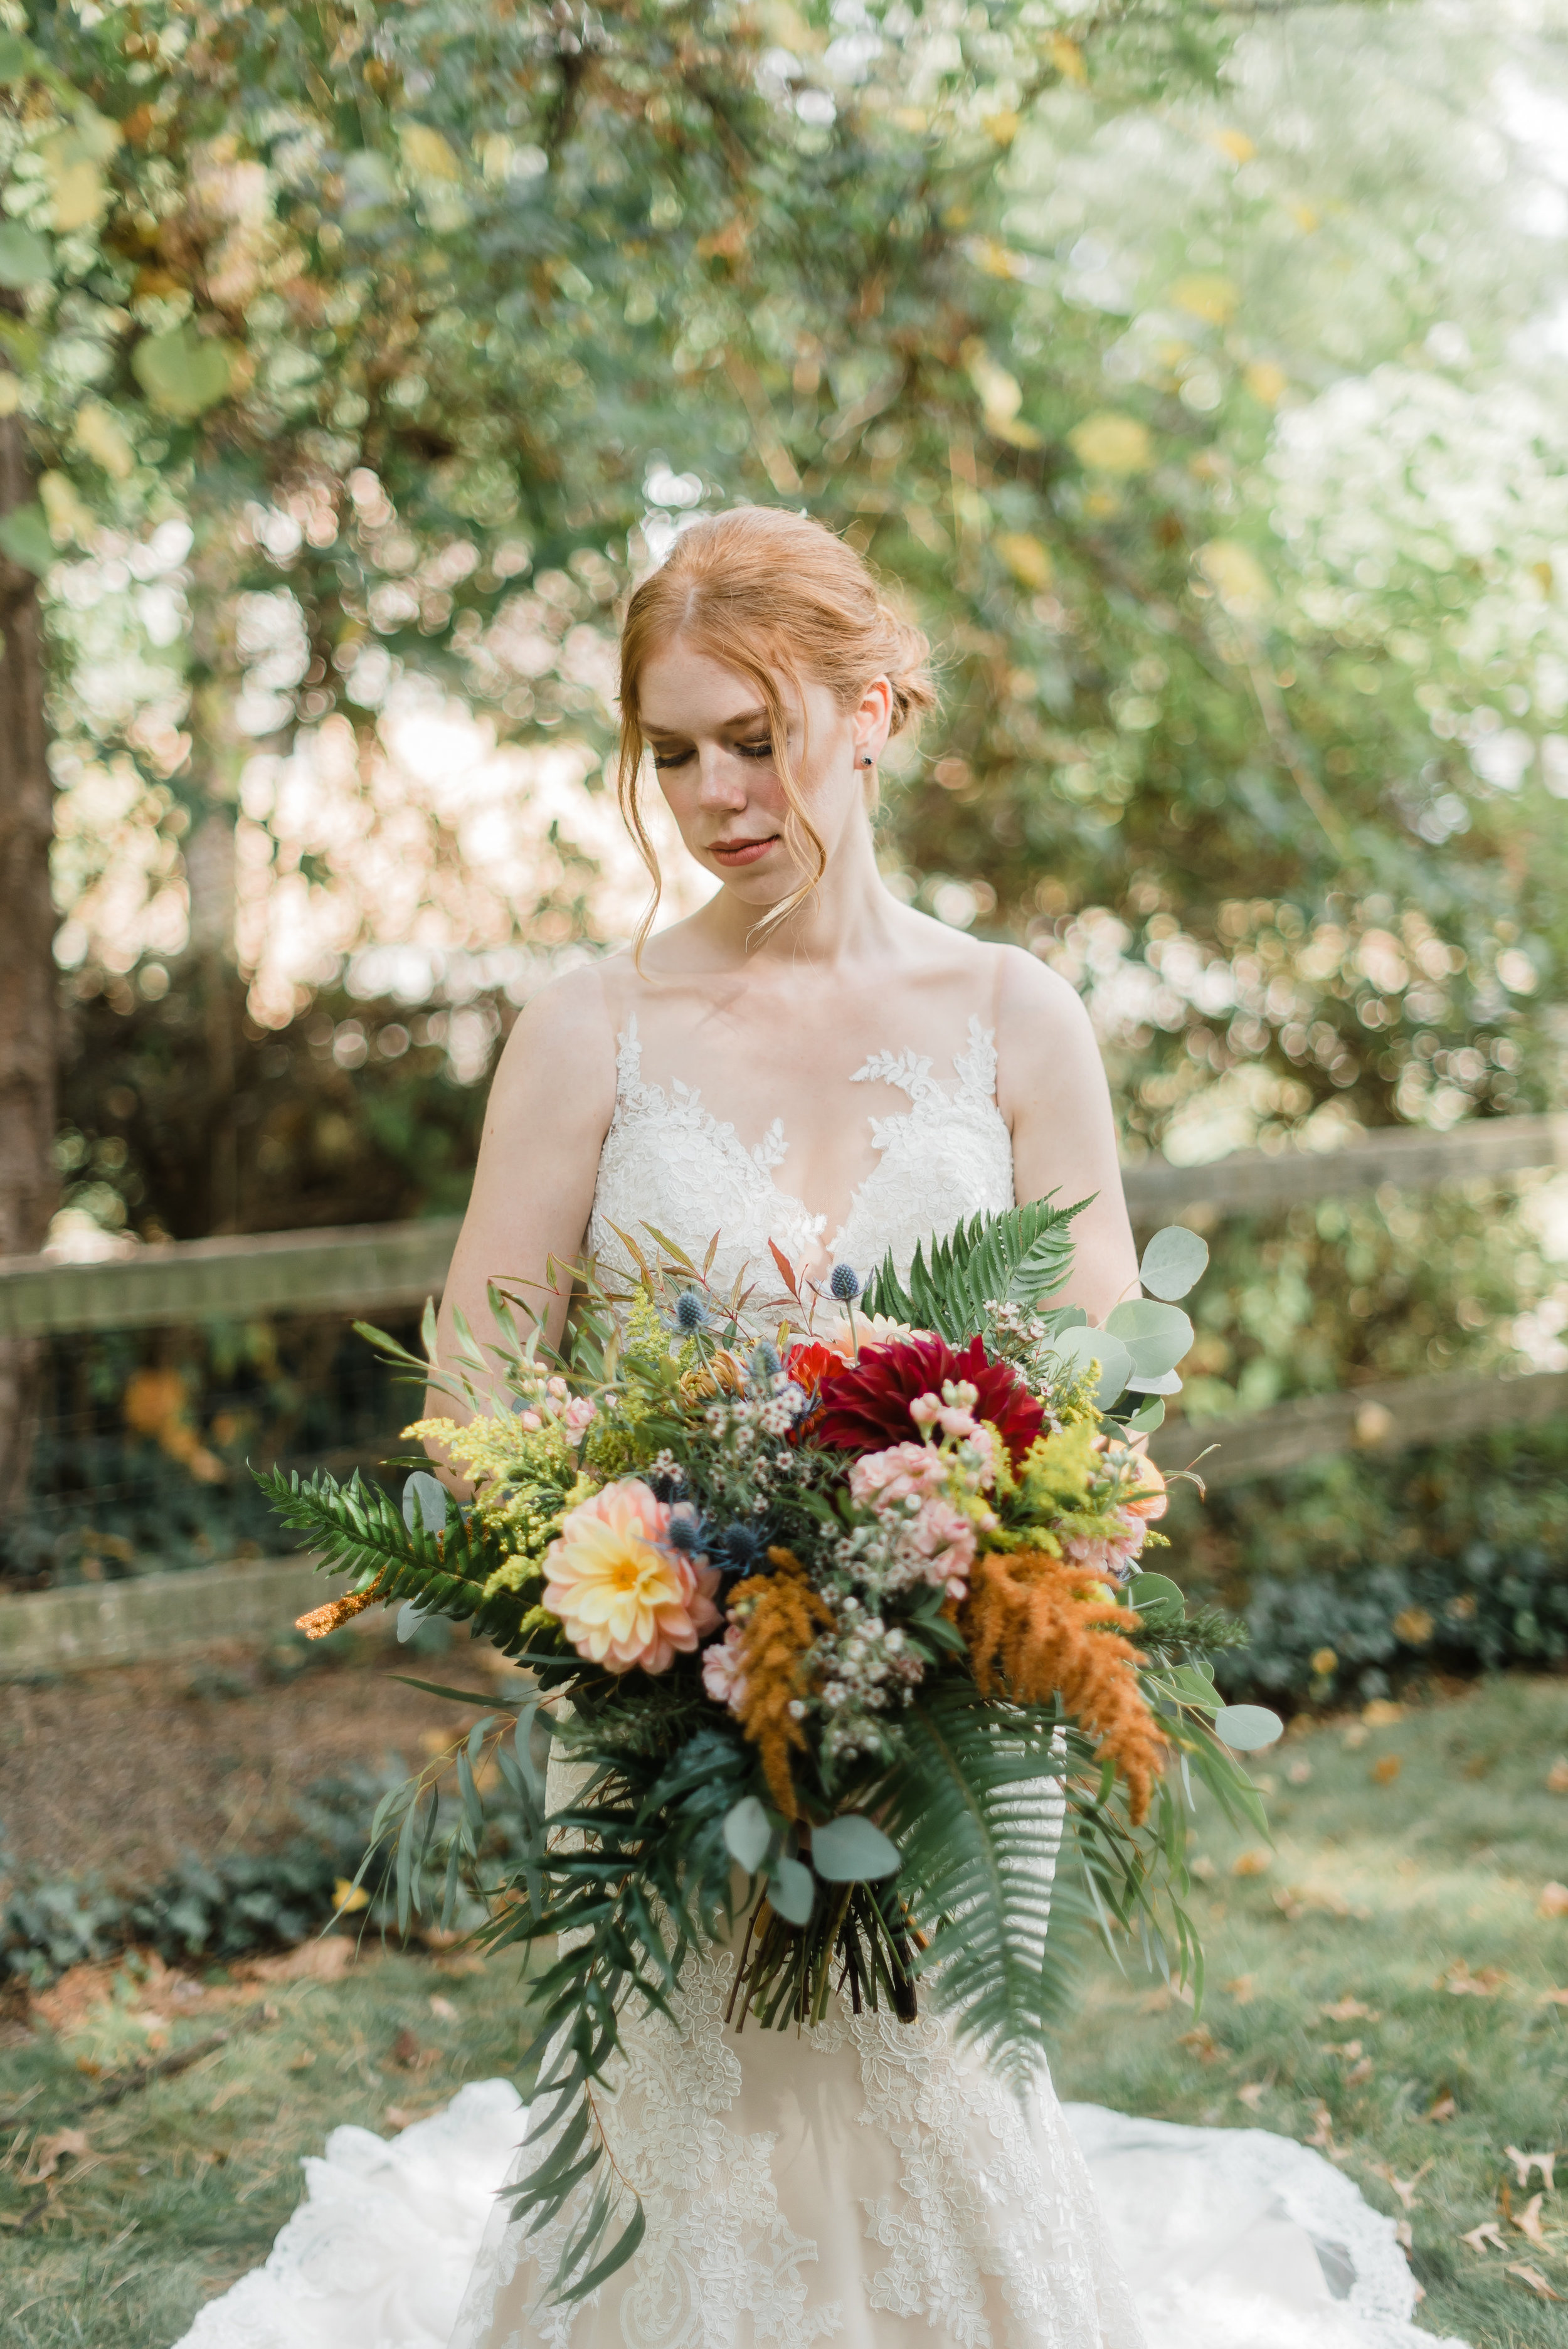 pittsburgh-wedding-photographer-modern-greenery-edgewoodclub-boho0125.jpg